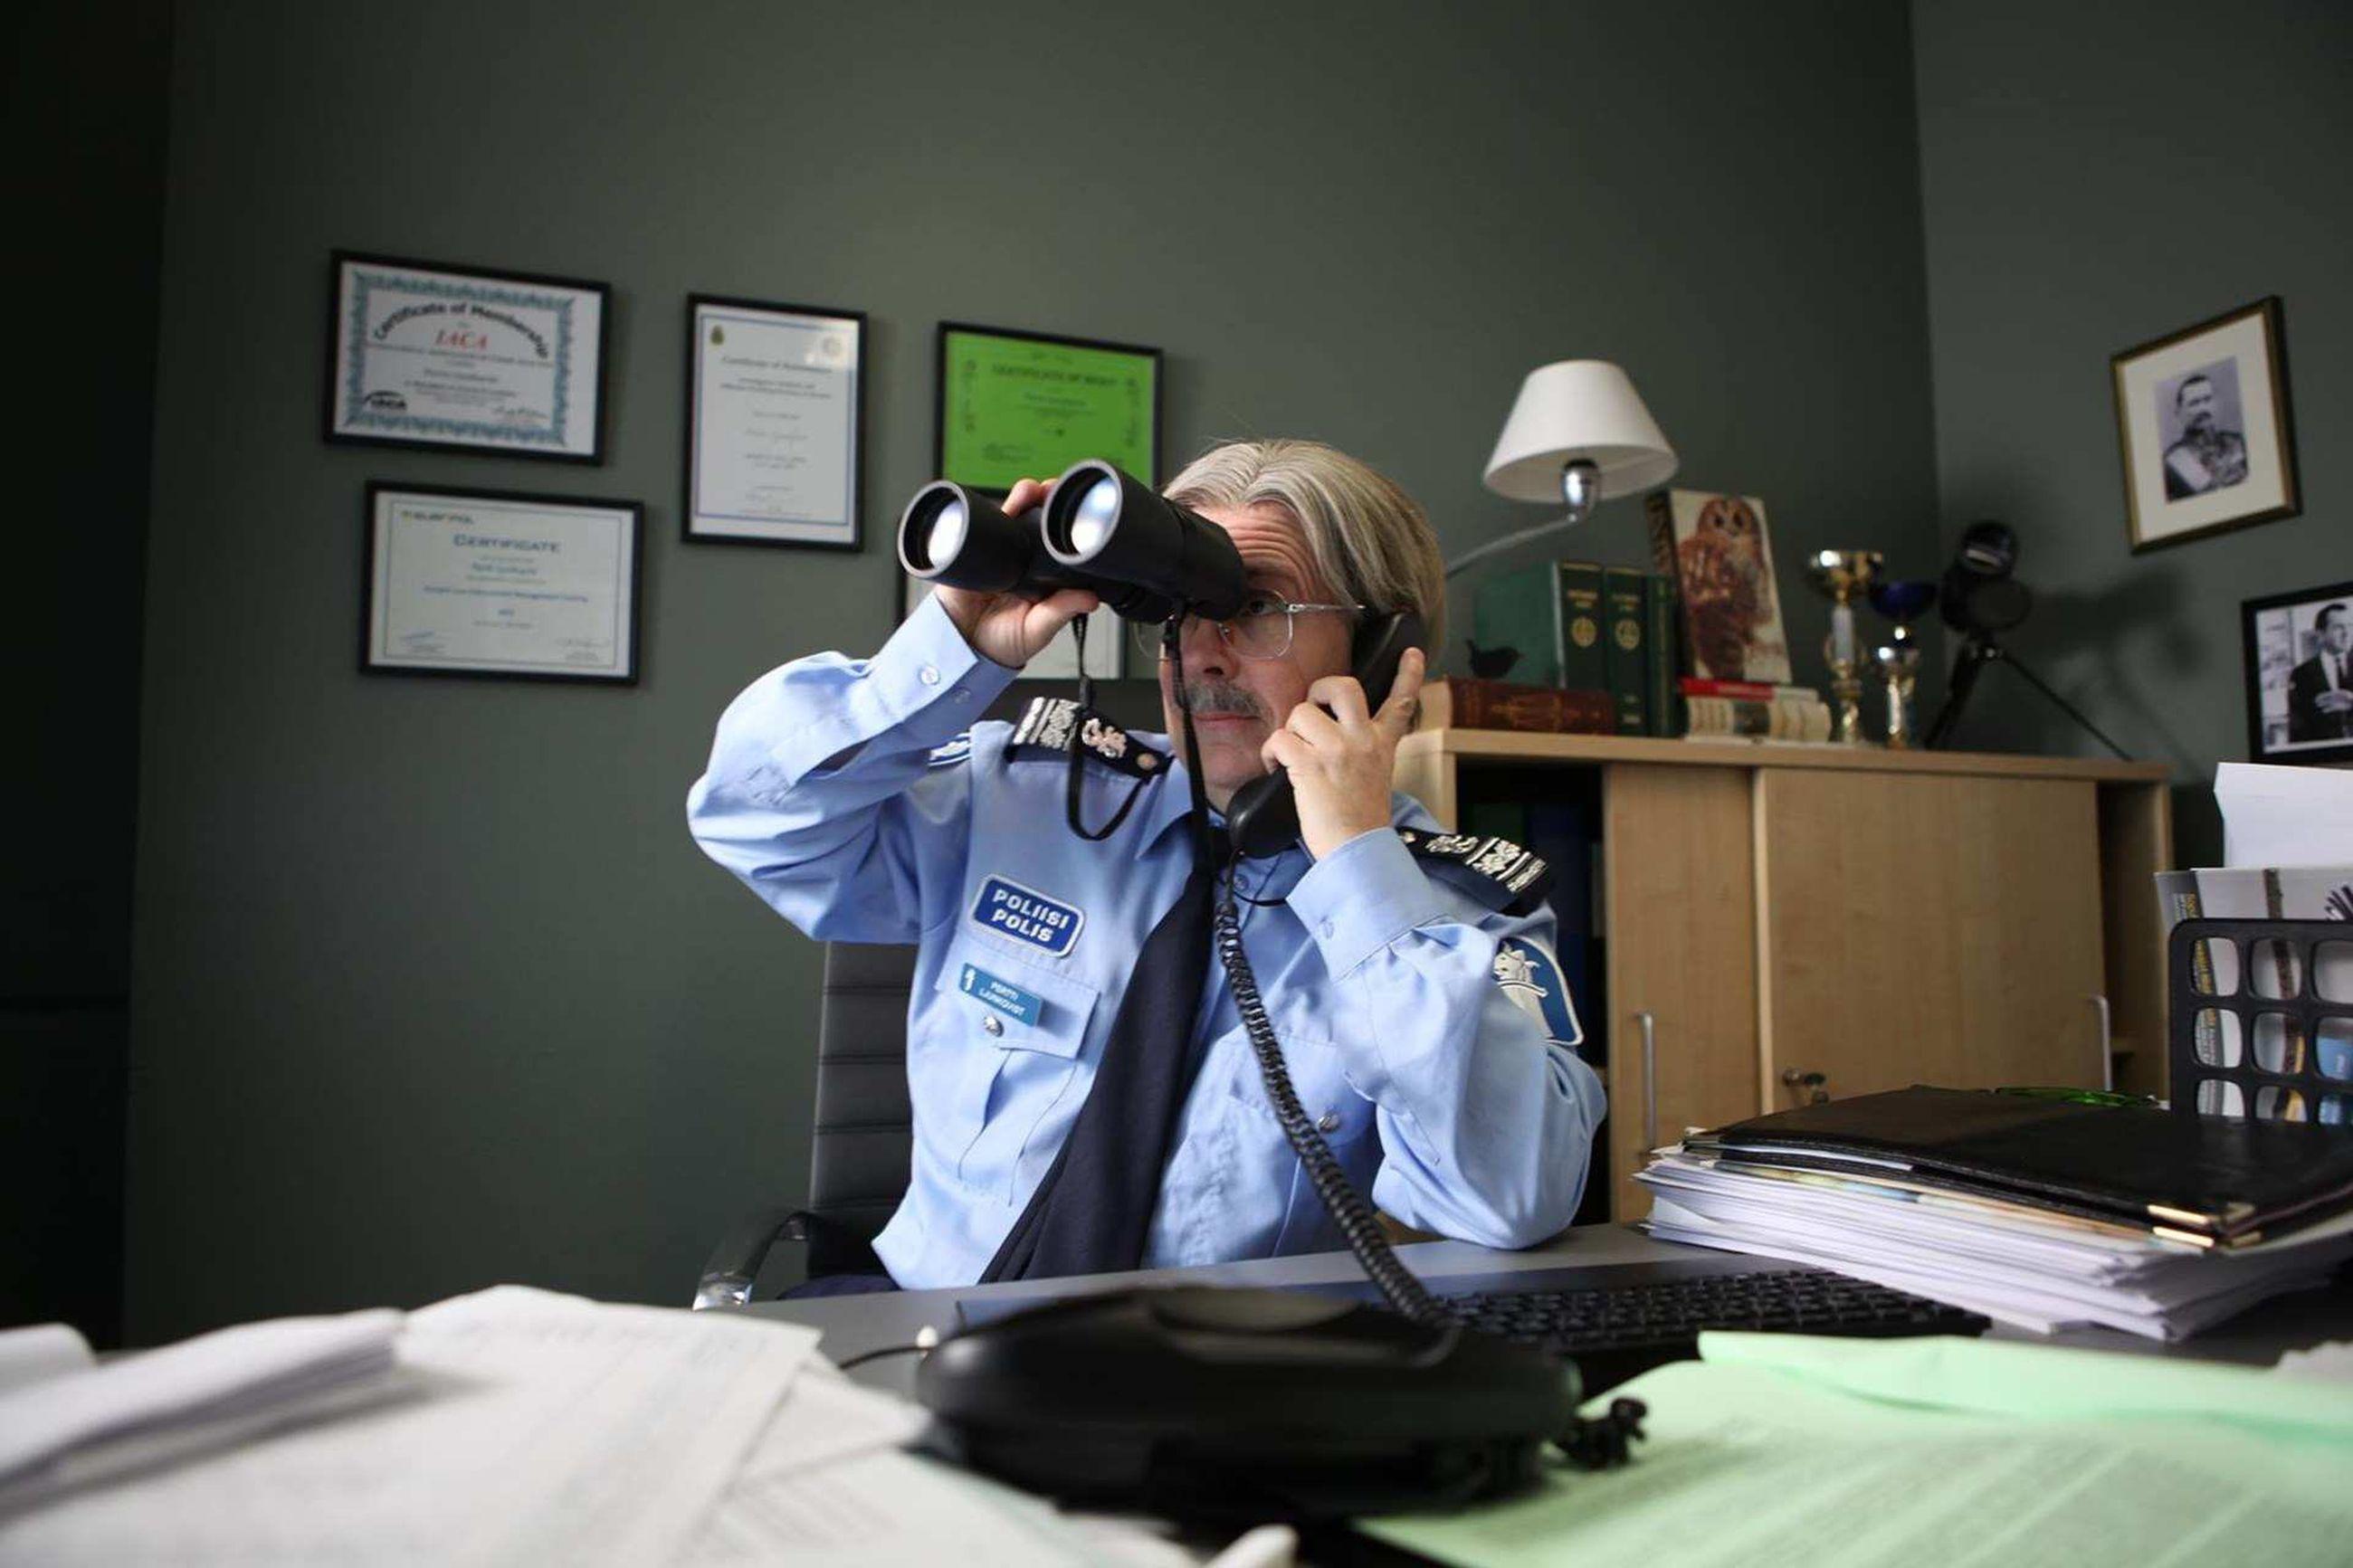 Kummeli Poliisi